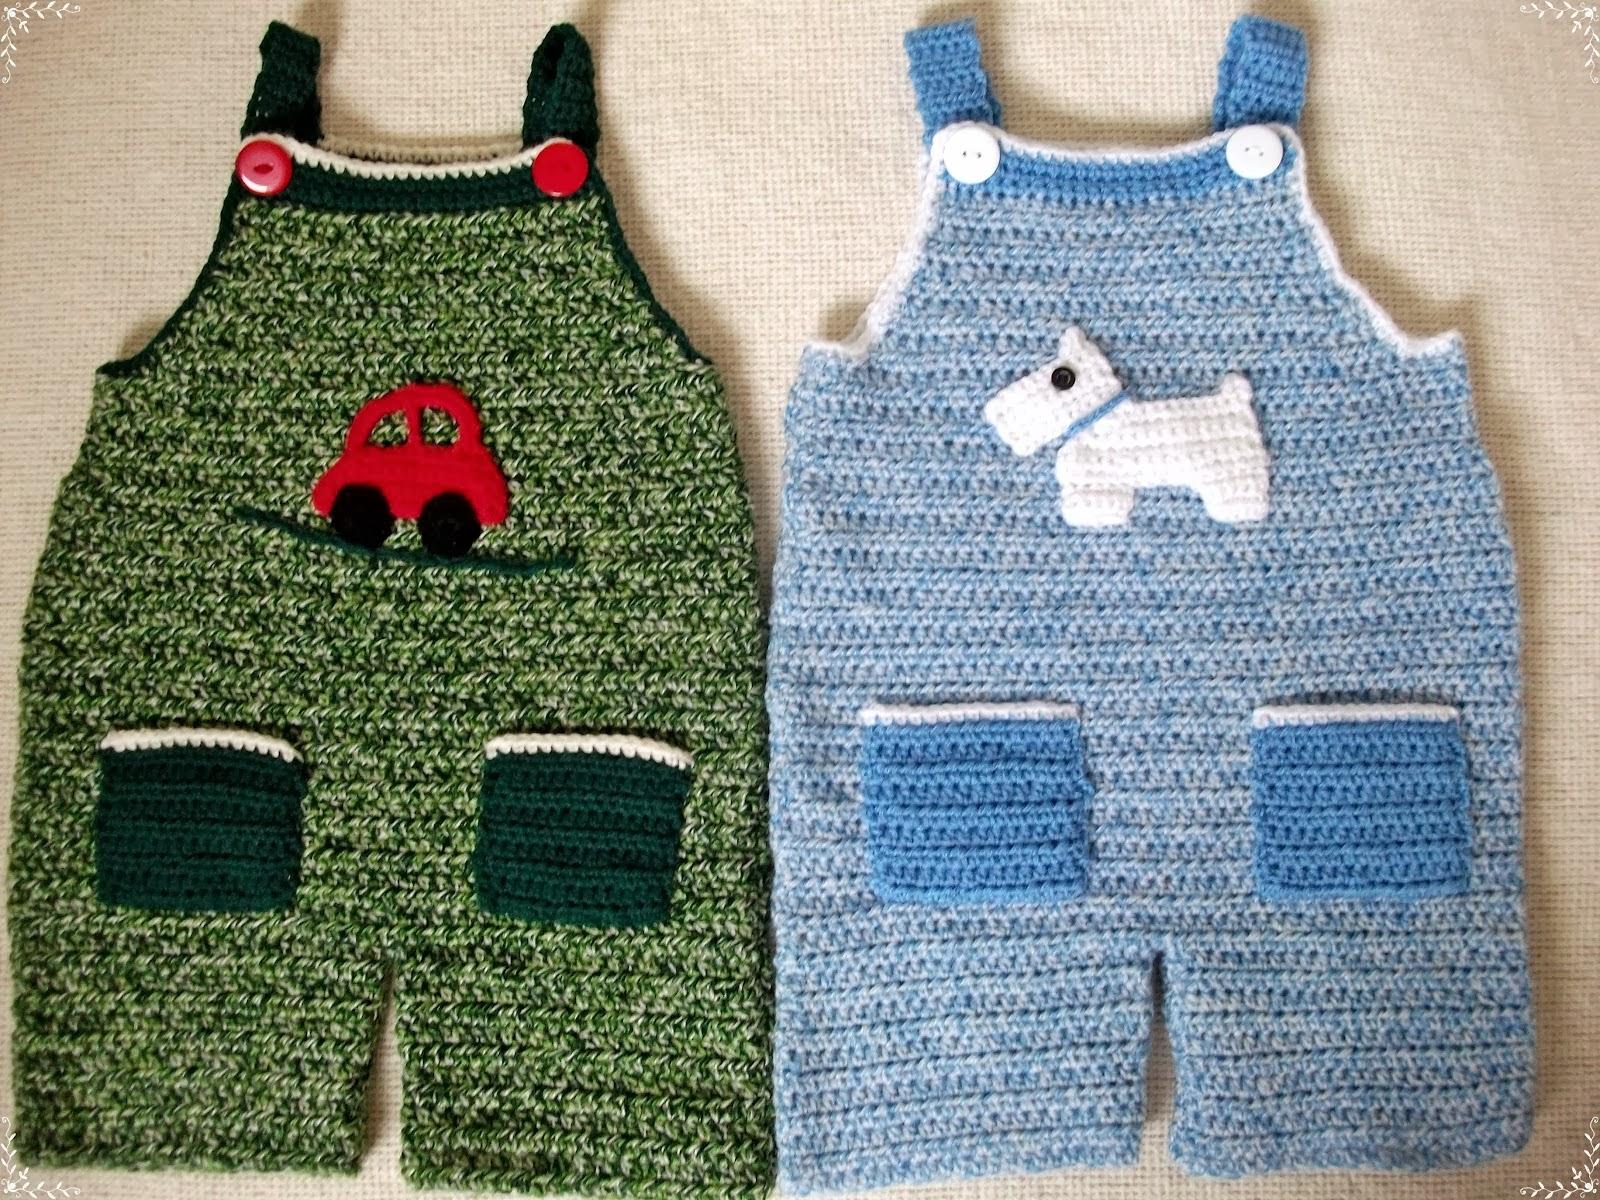 Madhuri Crochet & Yarns: Madhuri Crochet Sale